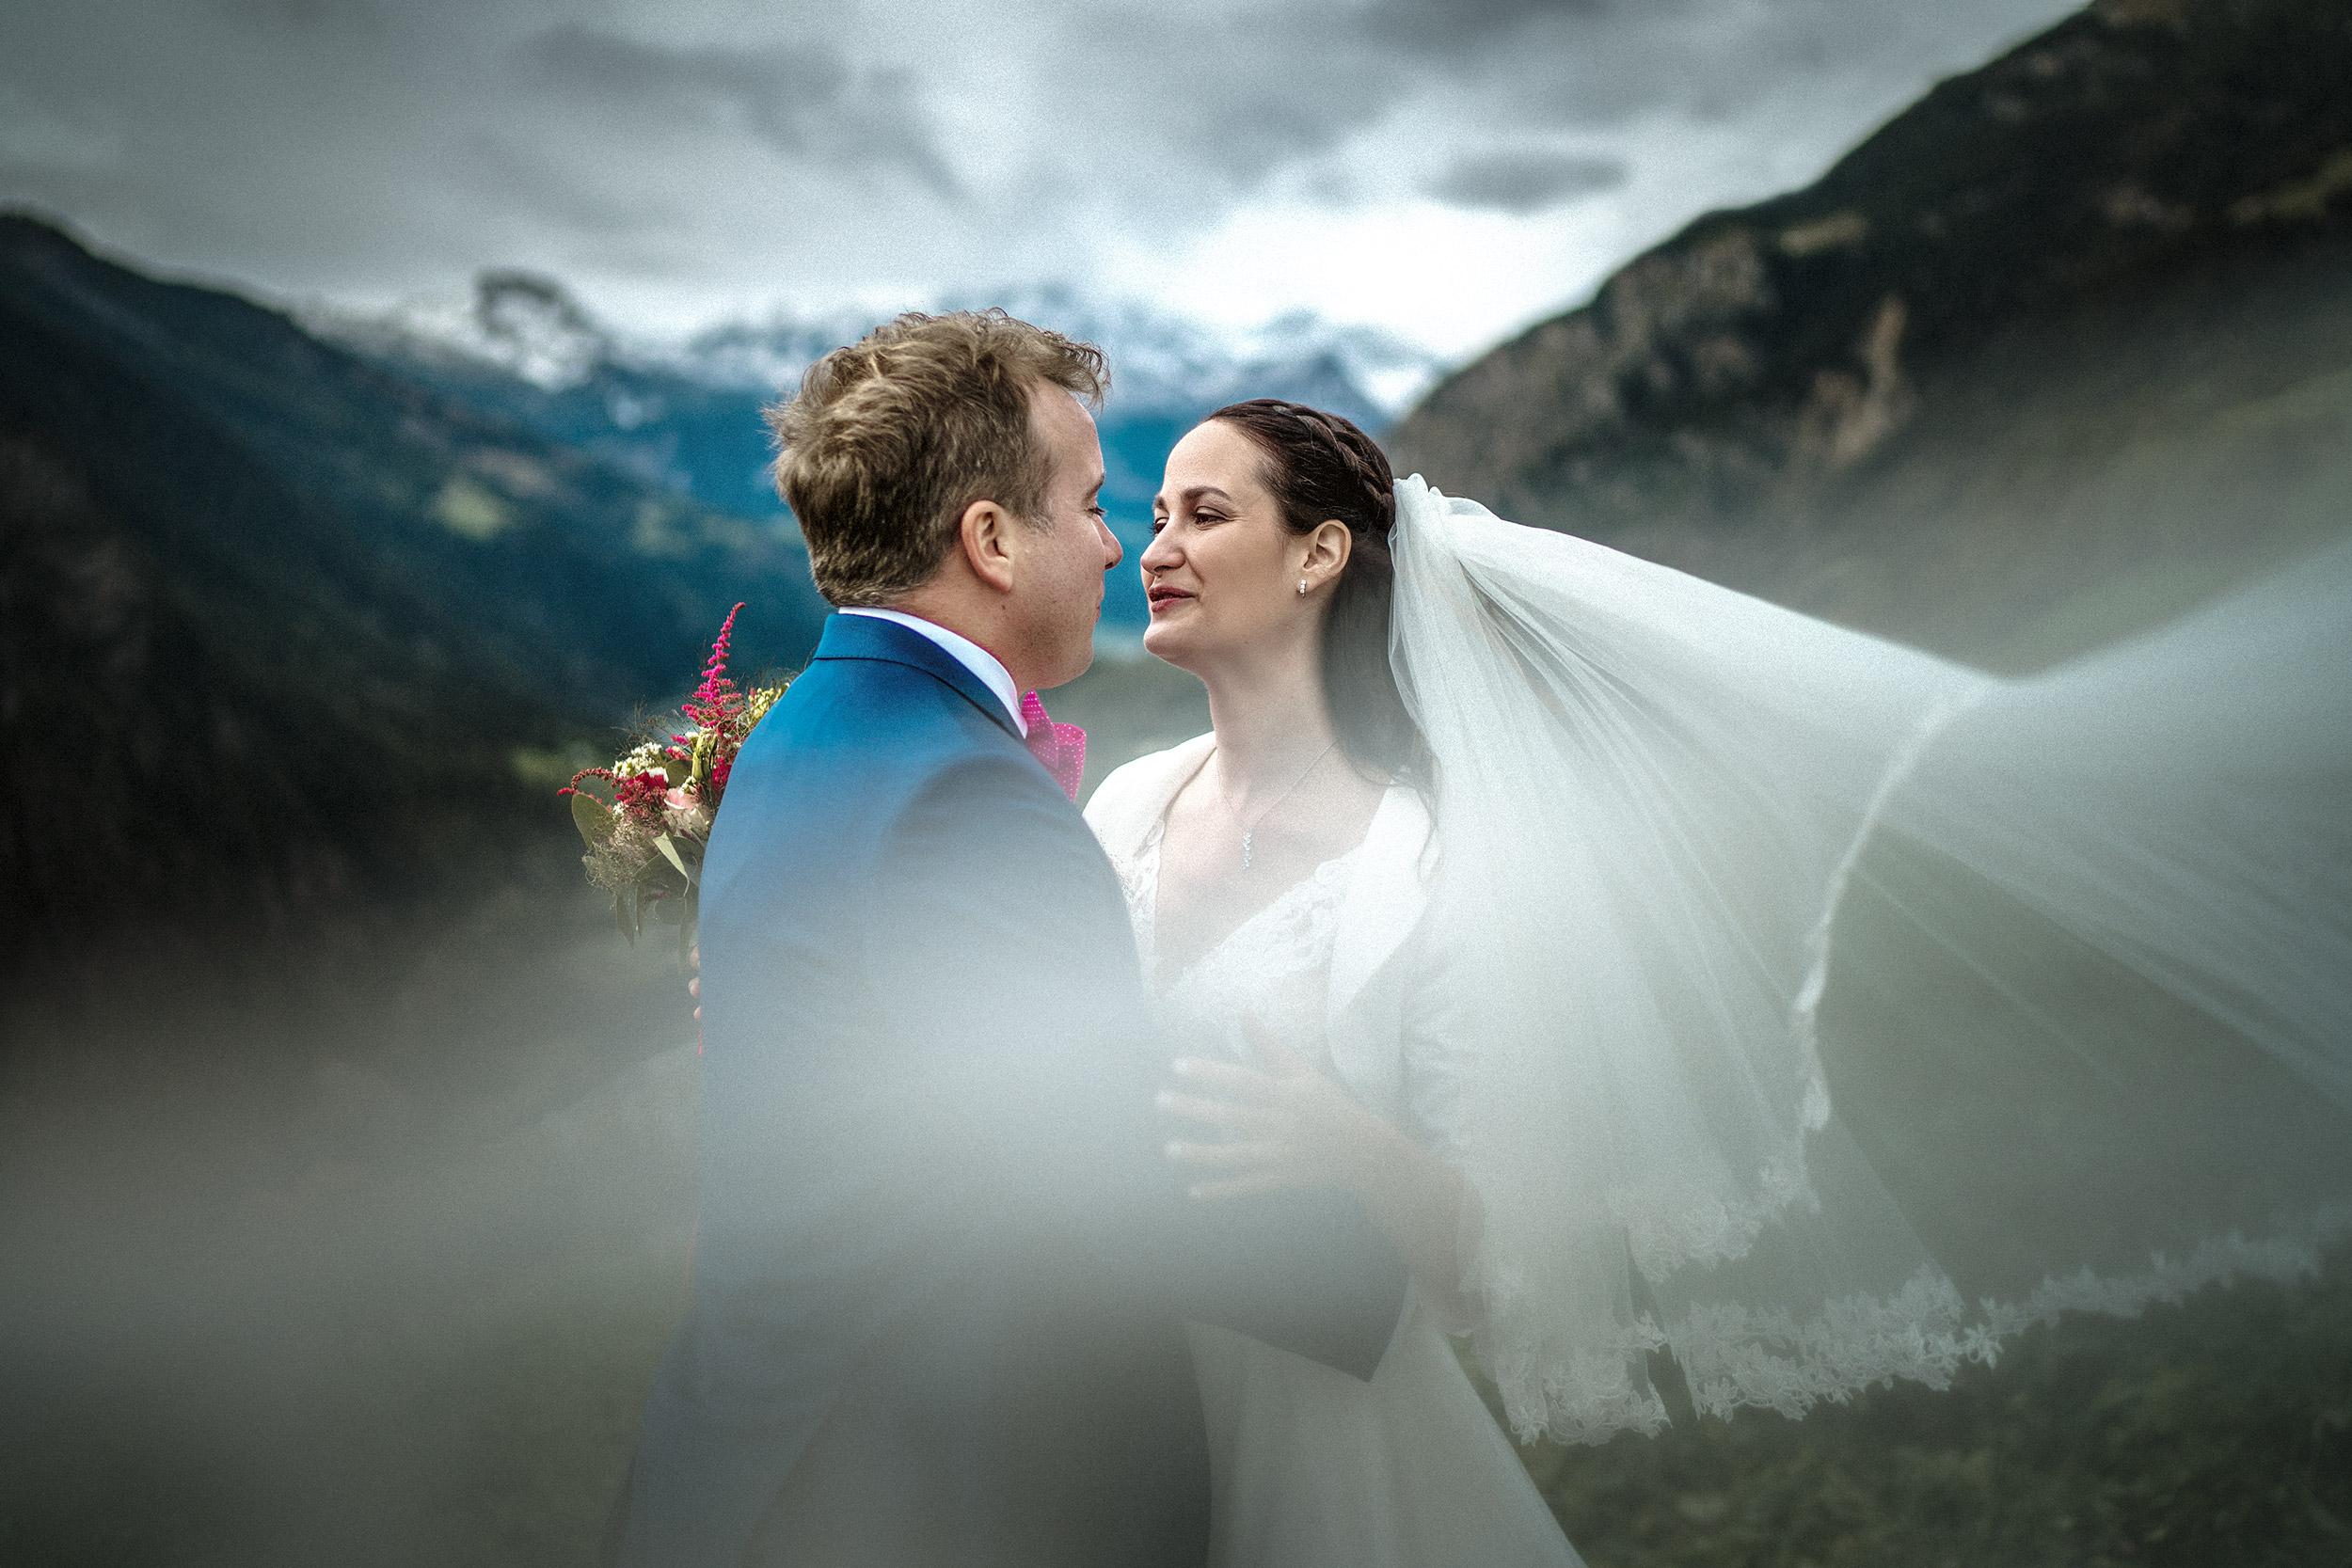 001 foto matrimonio reportage wedding poschiavo svizzera 2